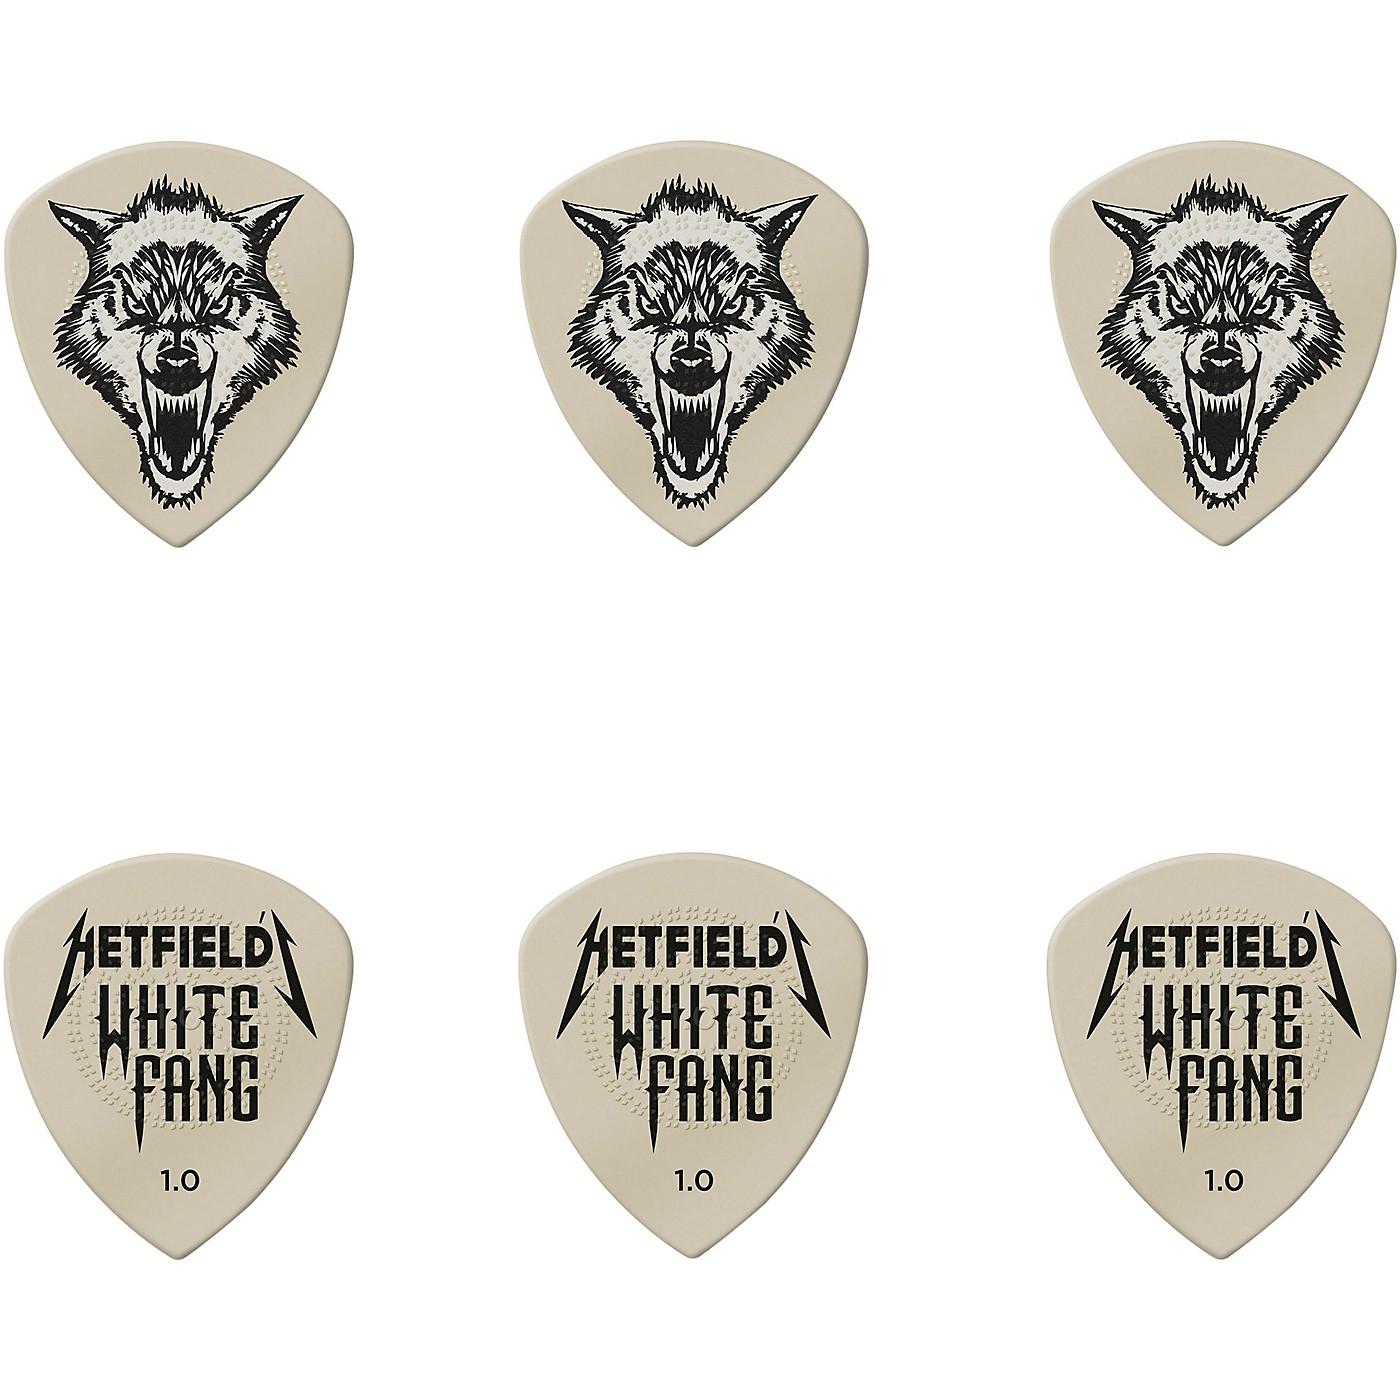 Dunlop James Hetfield Signature White Fang Guitar Picks and Tin thumbnail